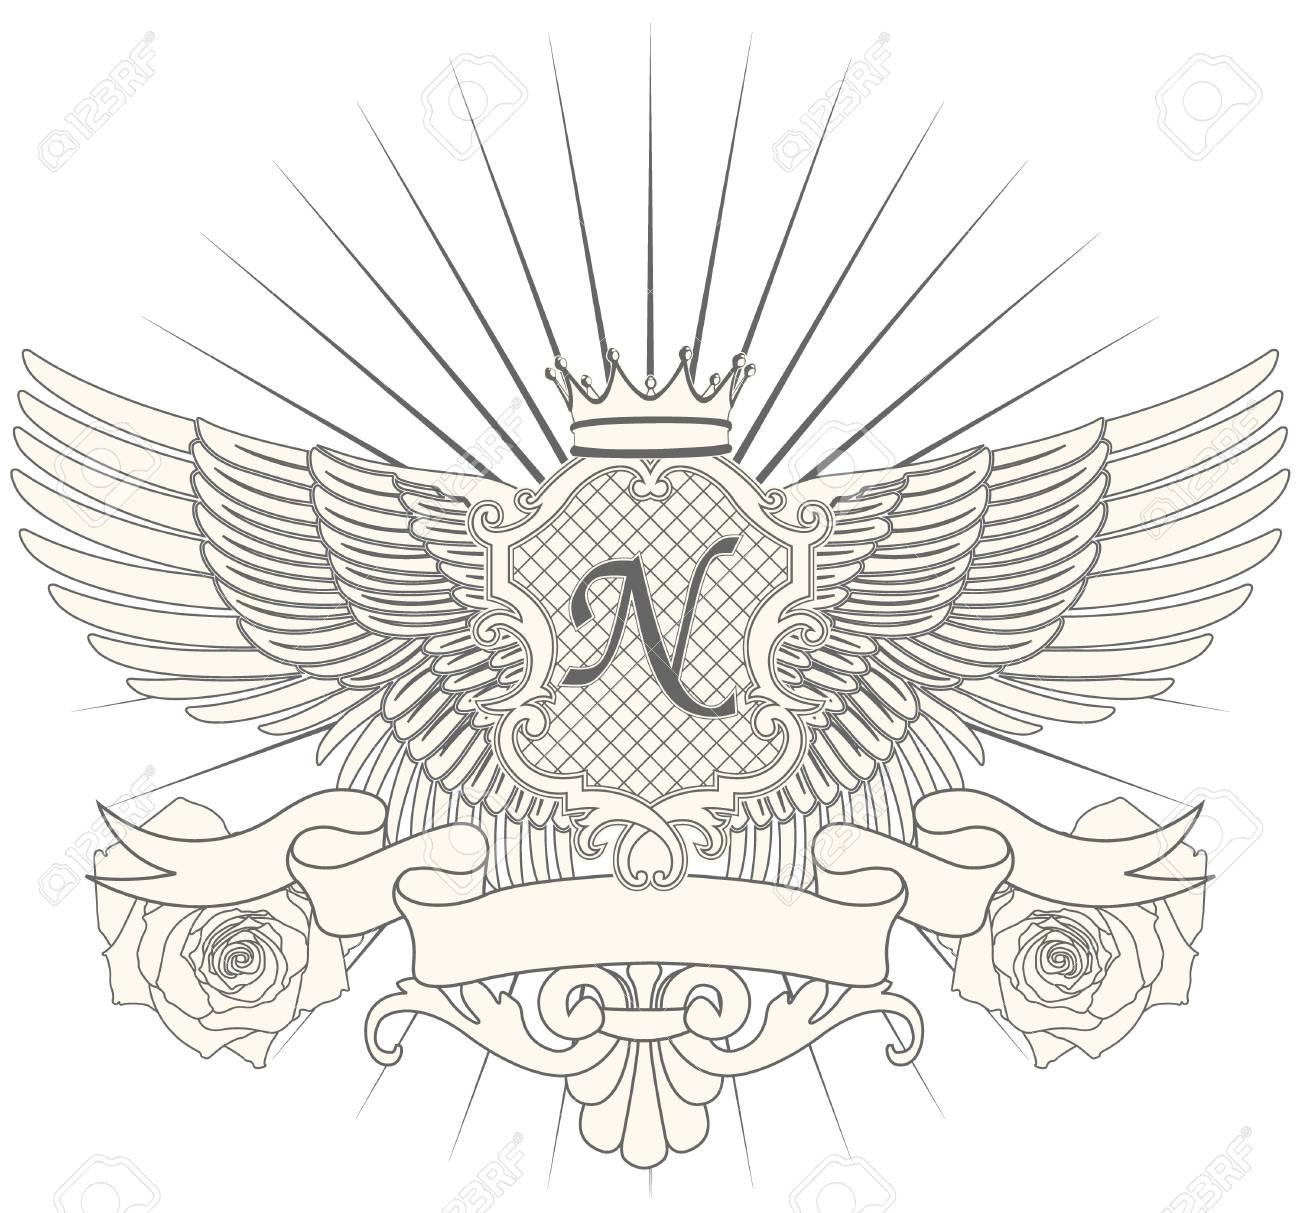 The vector image Heraldic symbol Stock Vector - 15285293